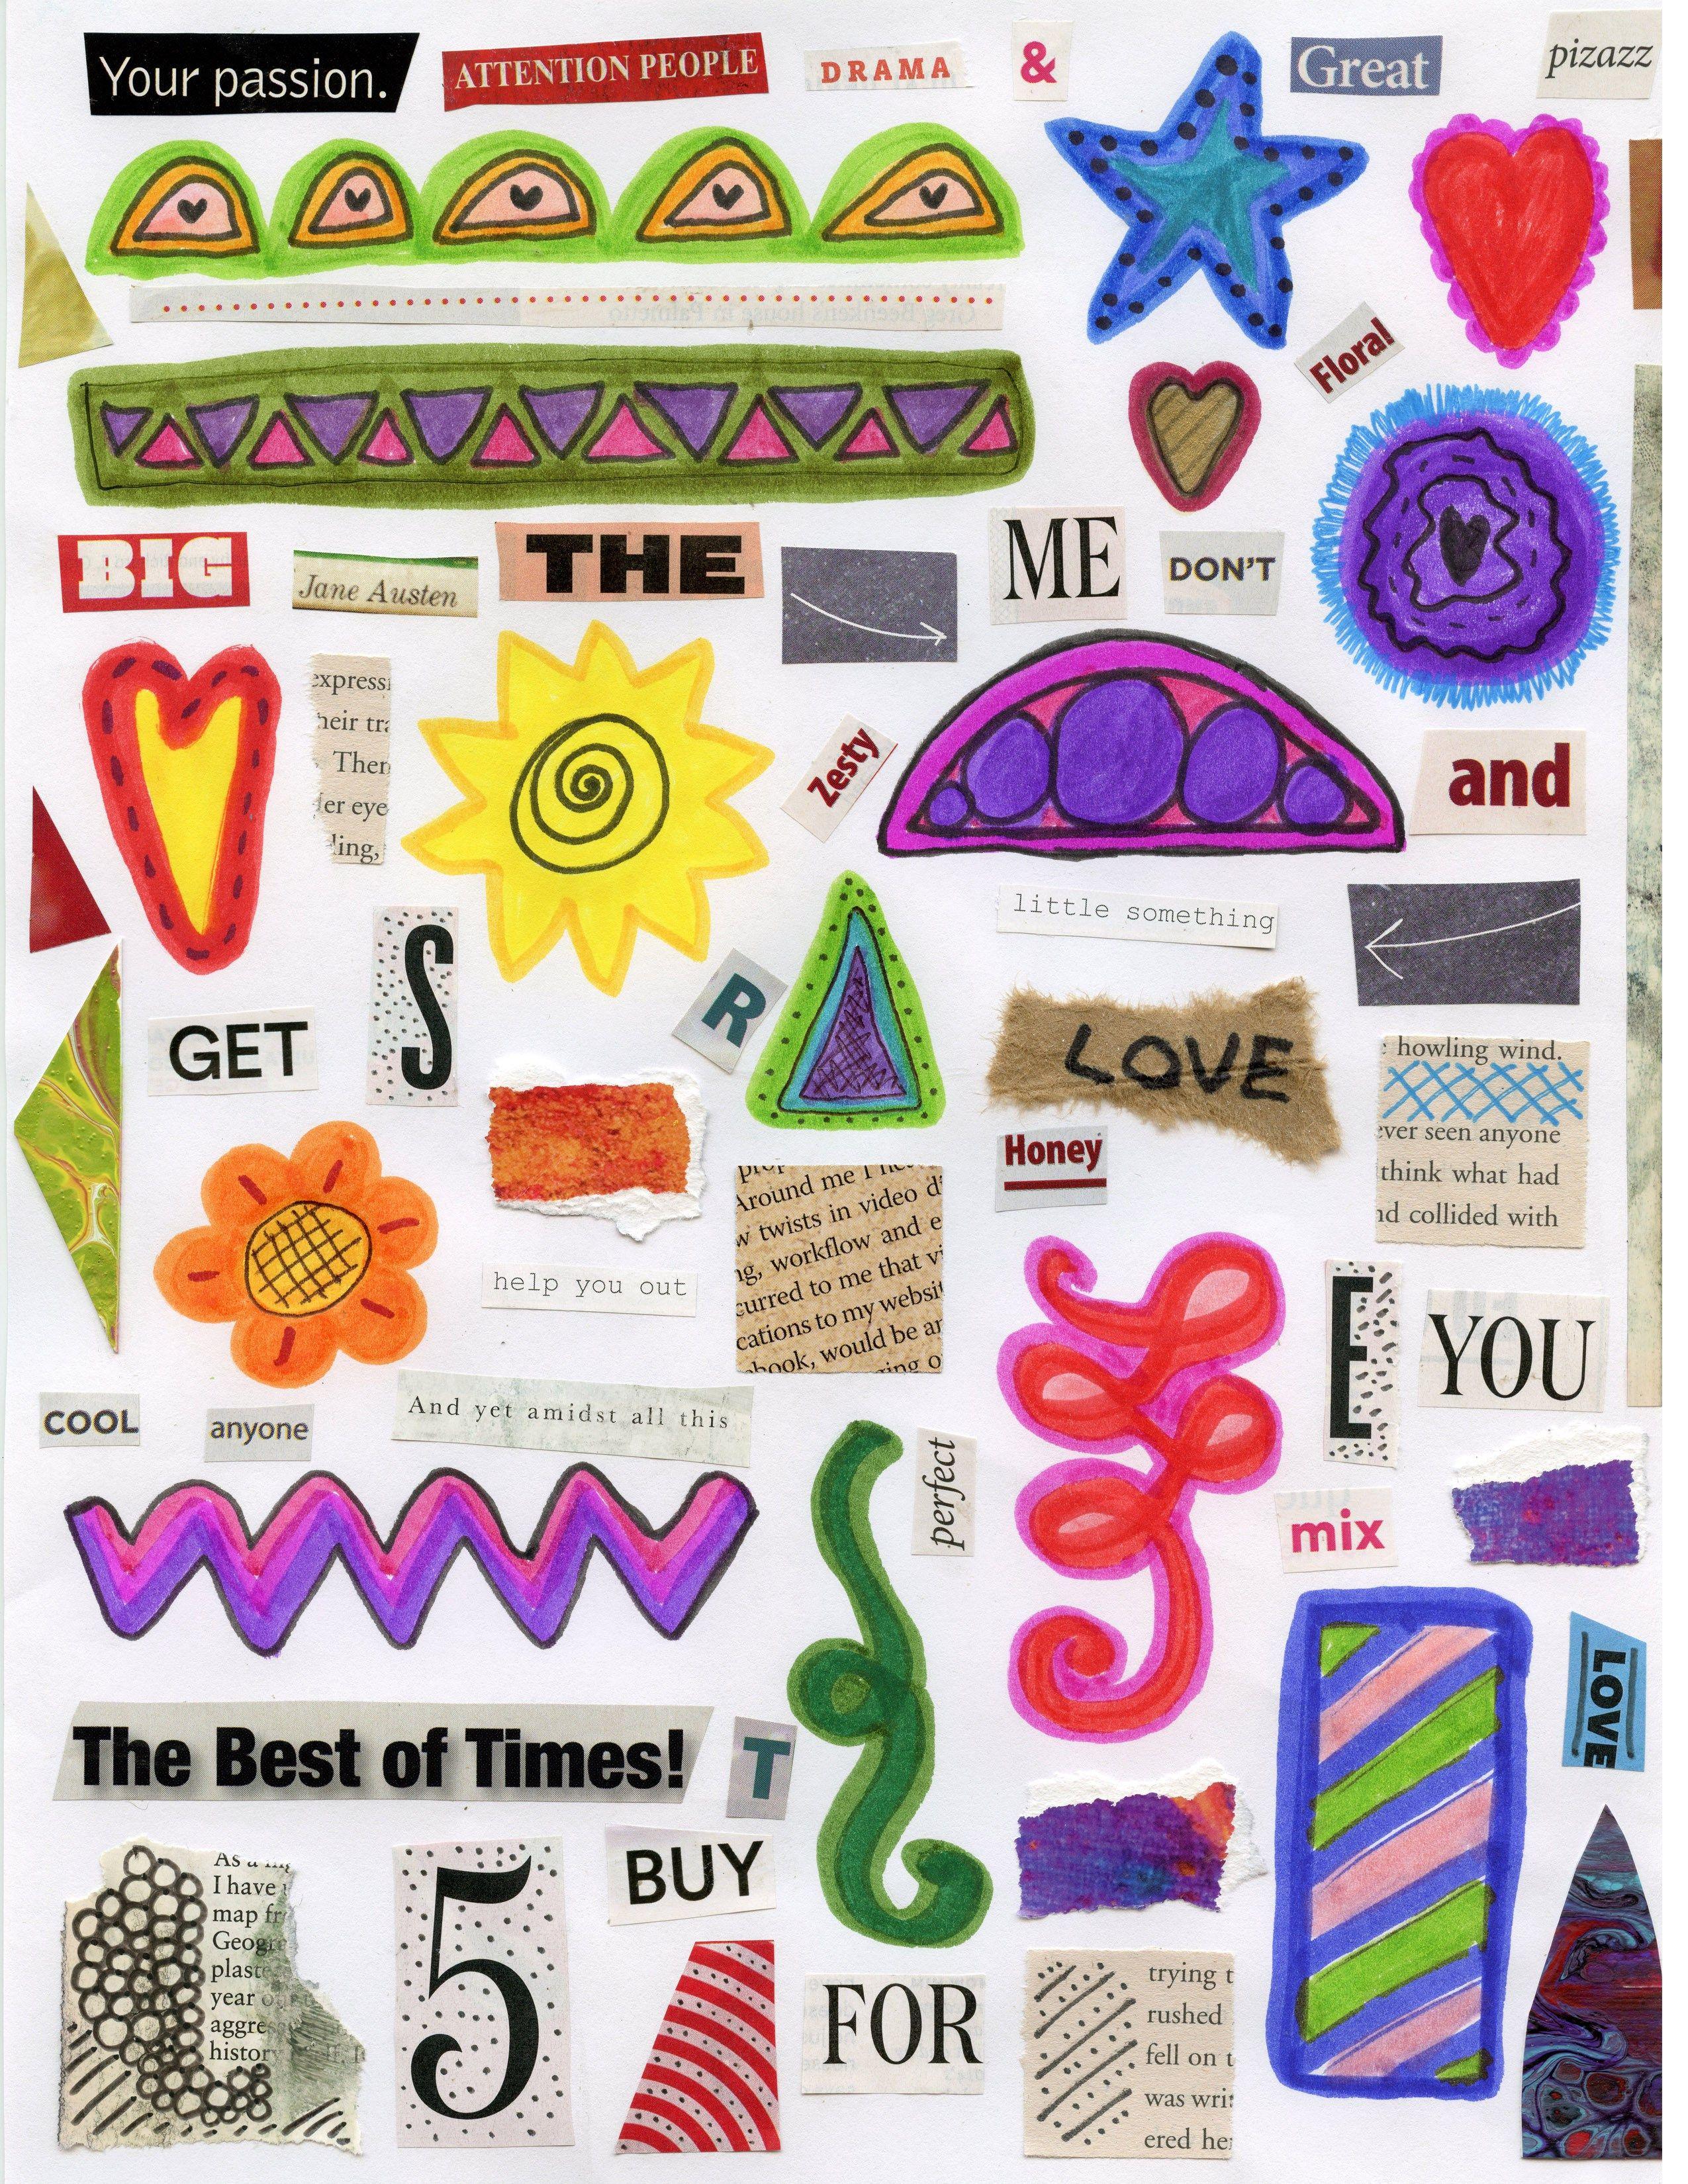 Set 1-4 Digital Download Collage Sheets Mixed Media 8.5 x 11 Printables